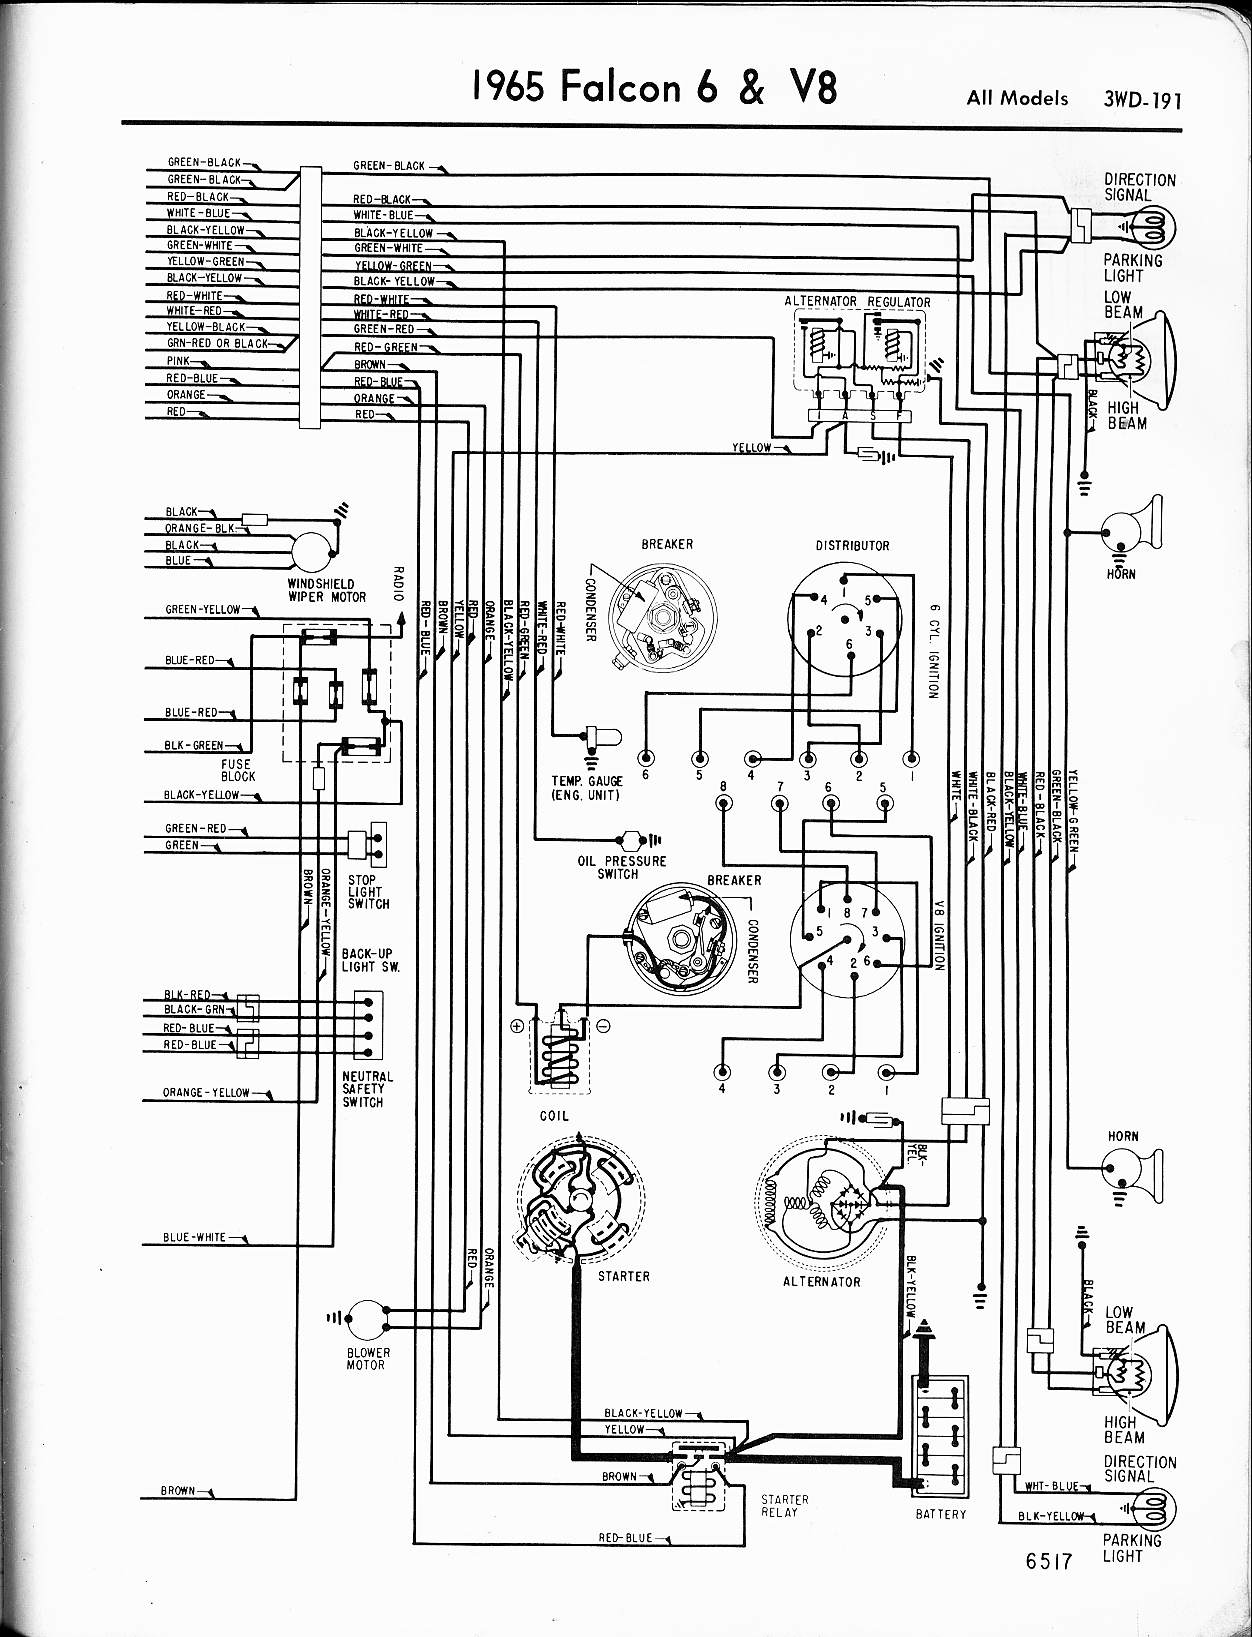 [SCHEMATICS_48IU]  SA_9307] 1965 Ford 6 And V8 Galaxie Part 1 Wiring Diagram Automotive Wiring  Download Diagram | 1966 Ford Galaxie 500 Wiring Diagram |  | Dome Carn Vira Mohammedshrine Librar Wiring 101